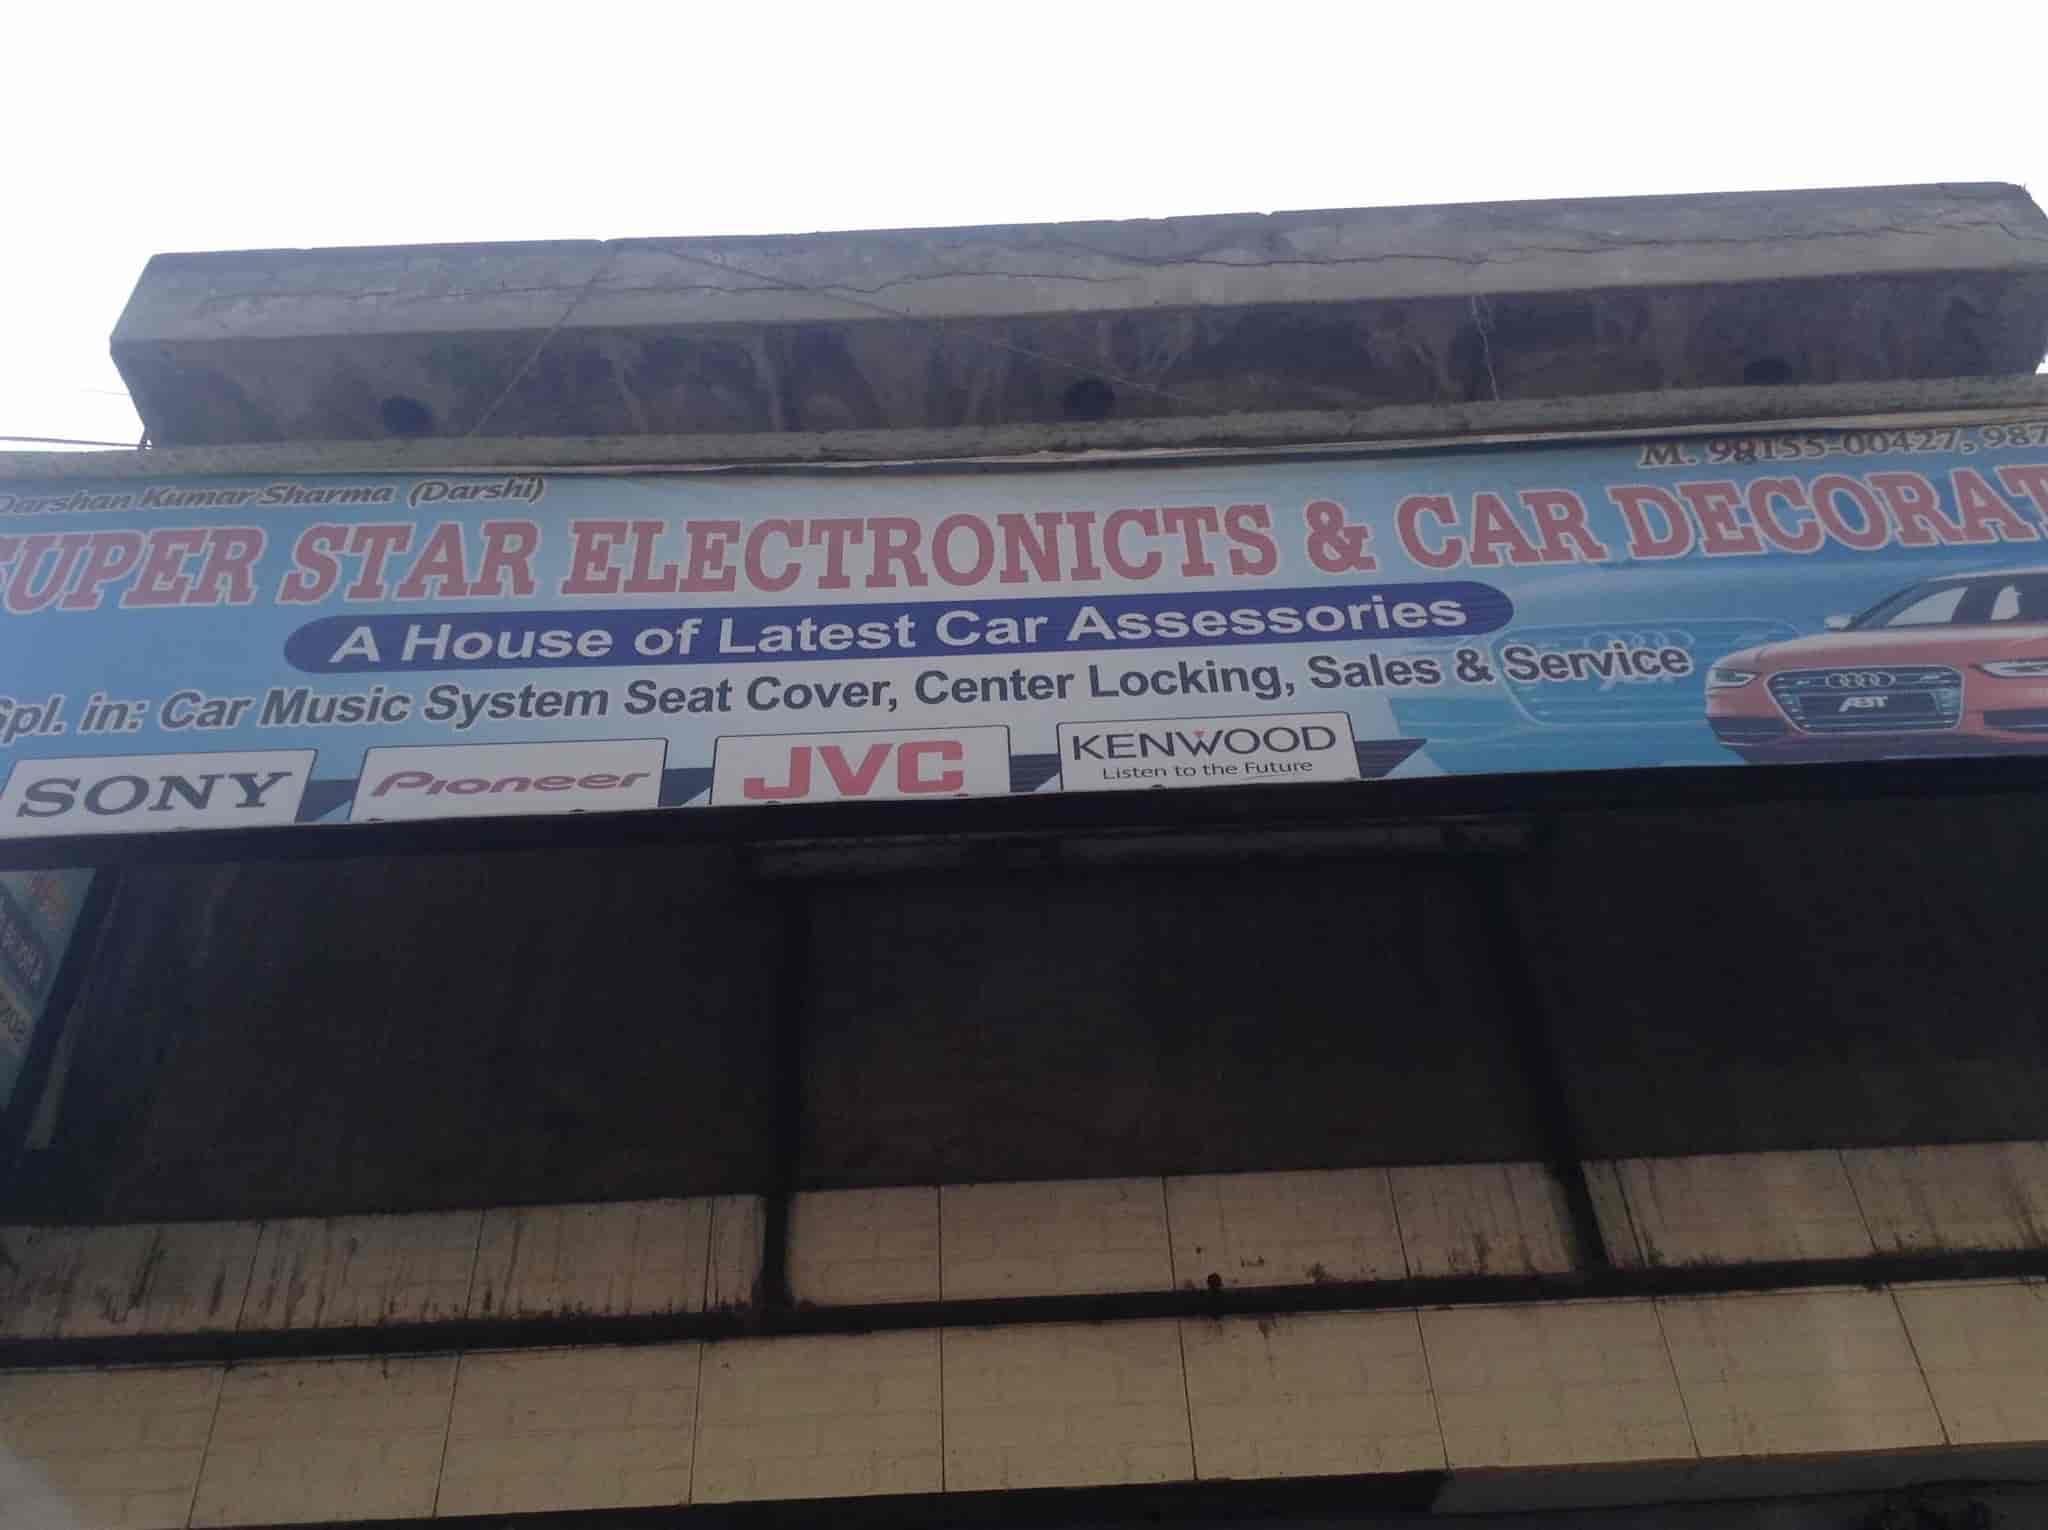 Super Star Electronics & Car Decorators, Mandigobindgarh